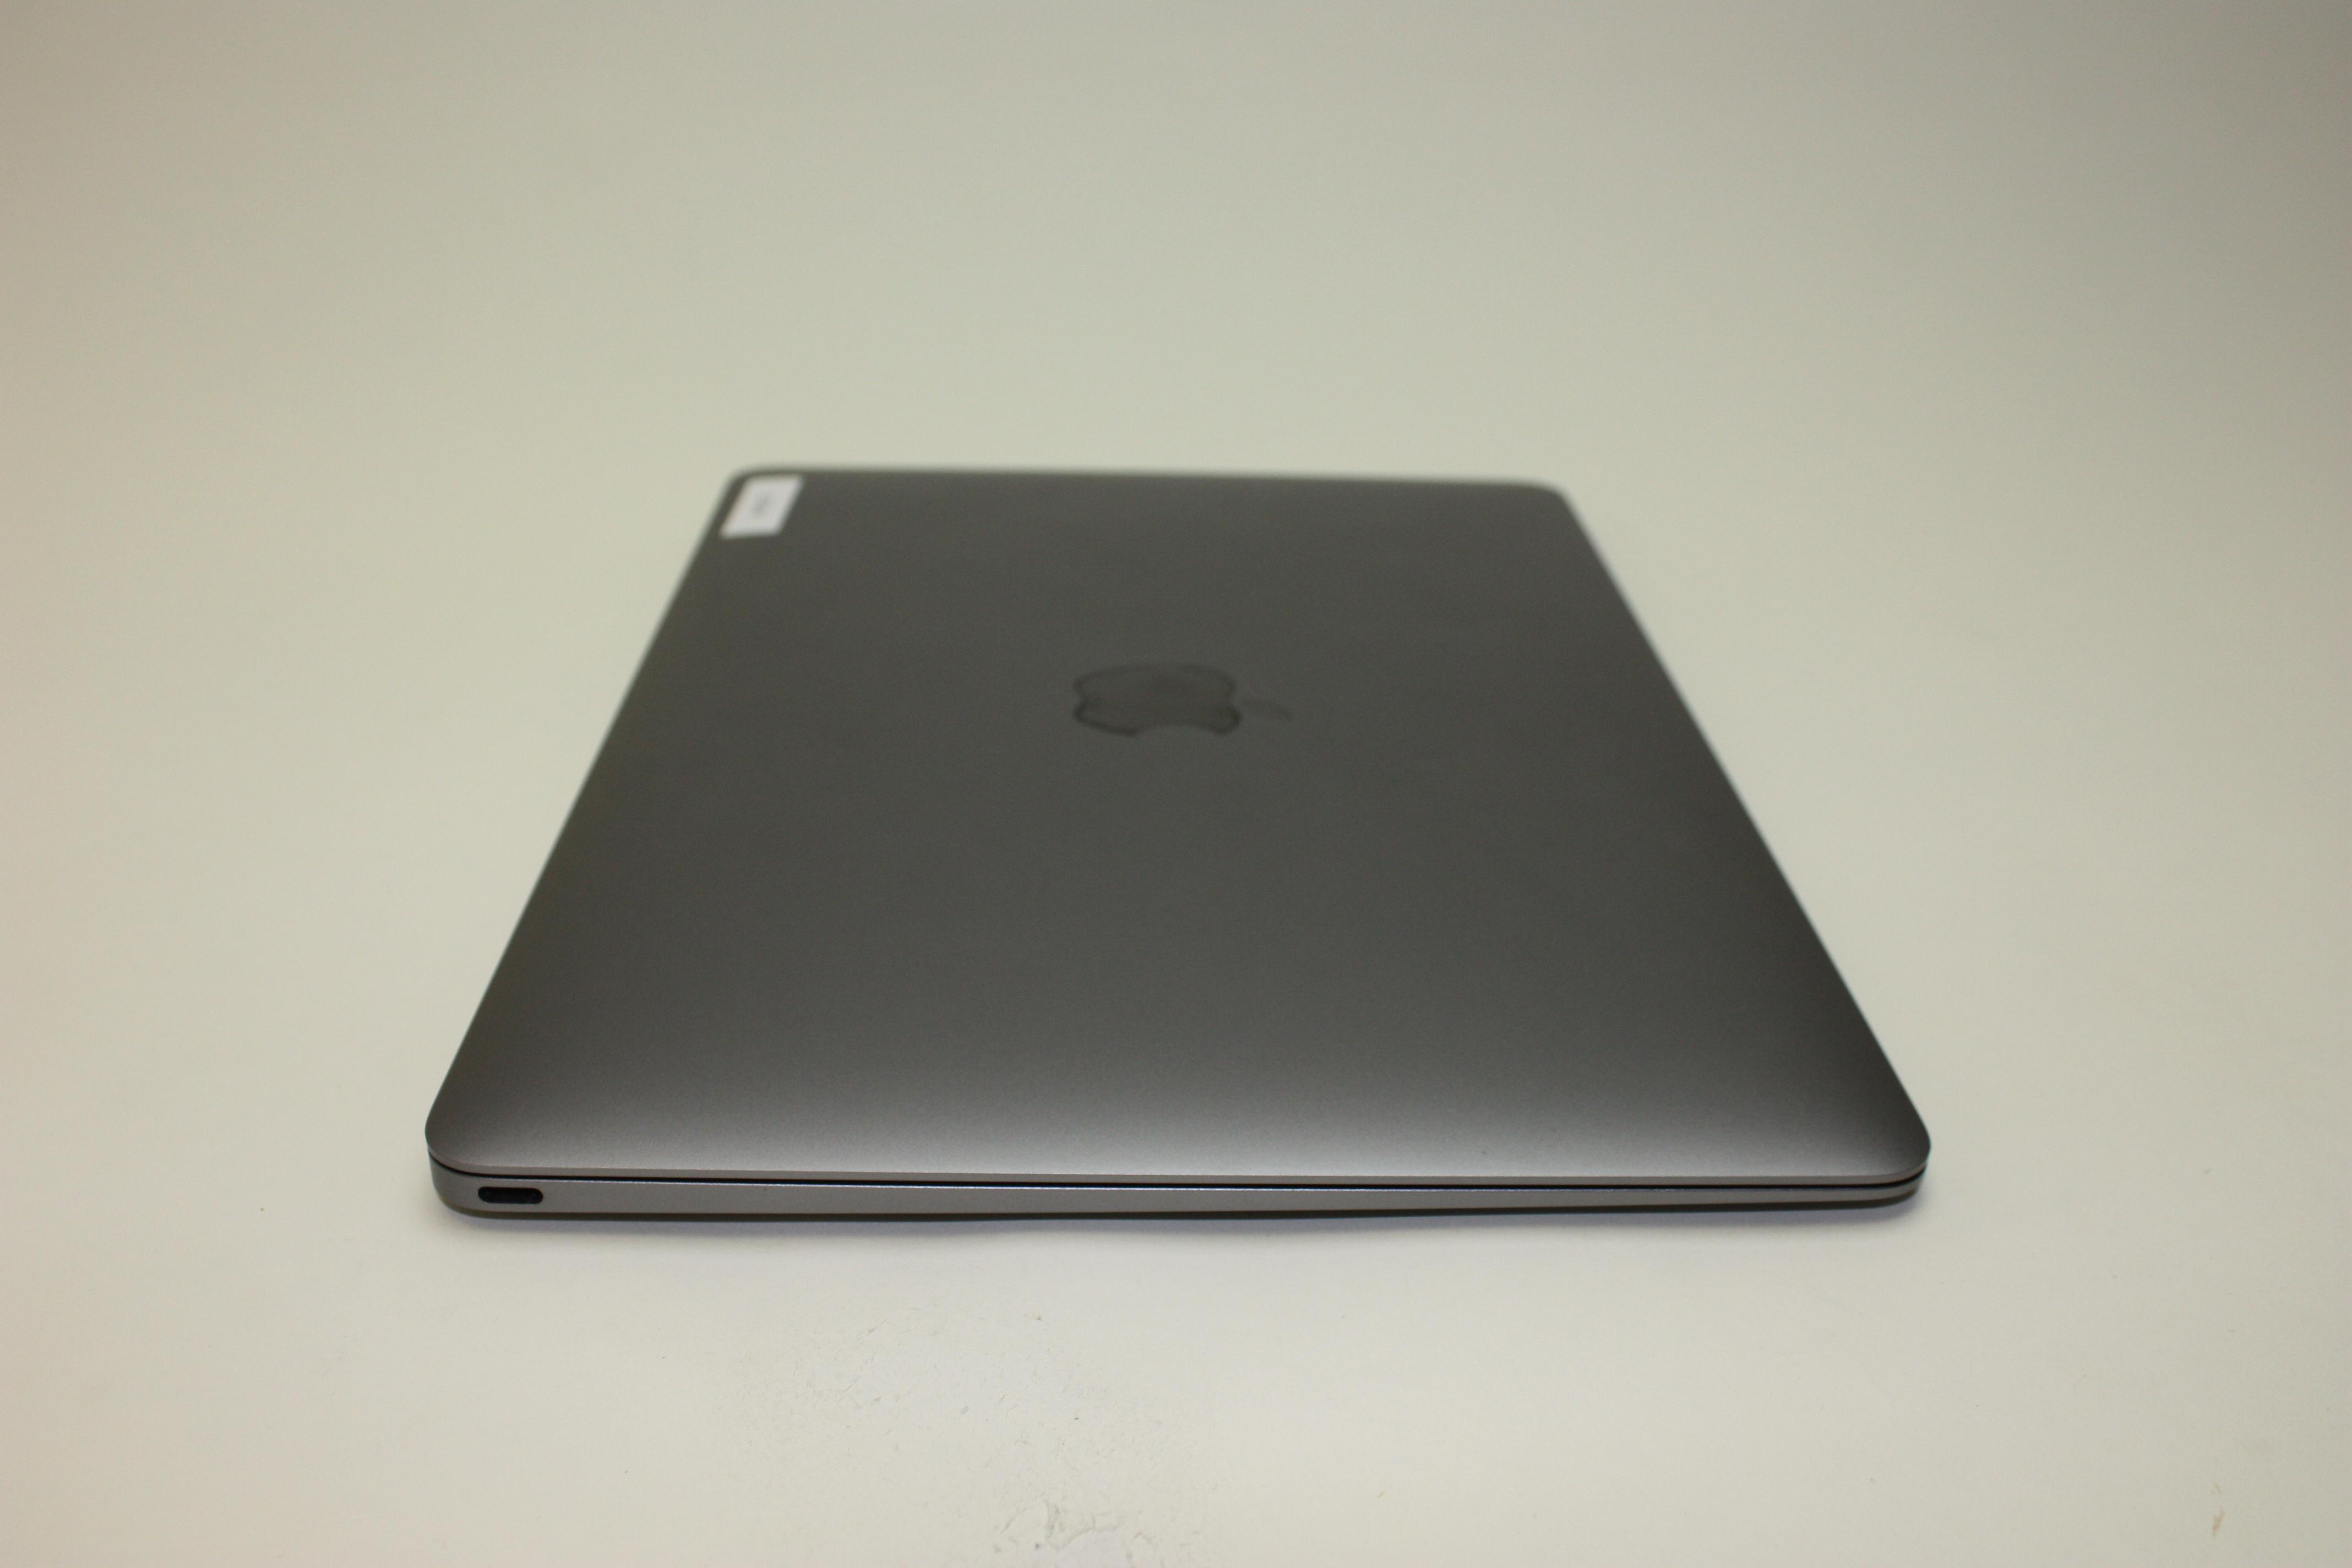 MacBook 12-inch Retina, 1.3 GHz Core M (M-5Y71), 8 GB 1867 MHz DDR3, 256 GB Flash Storage, image 5